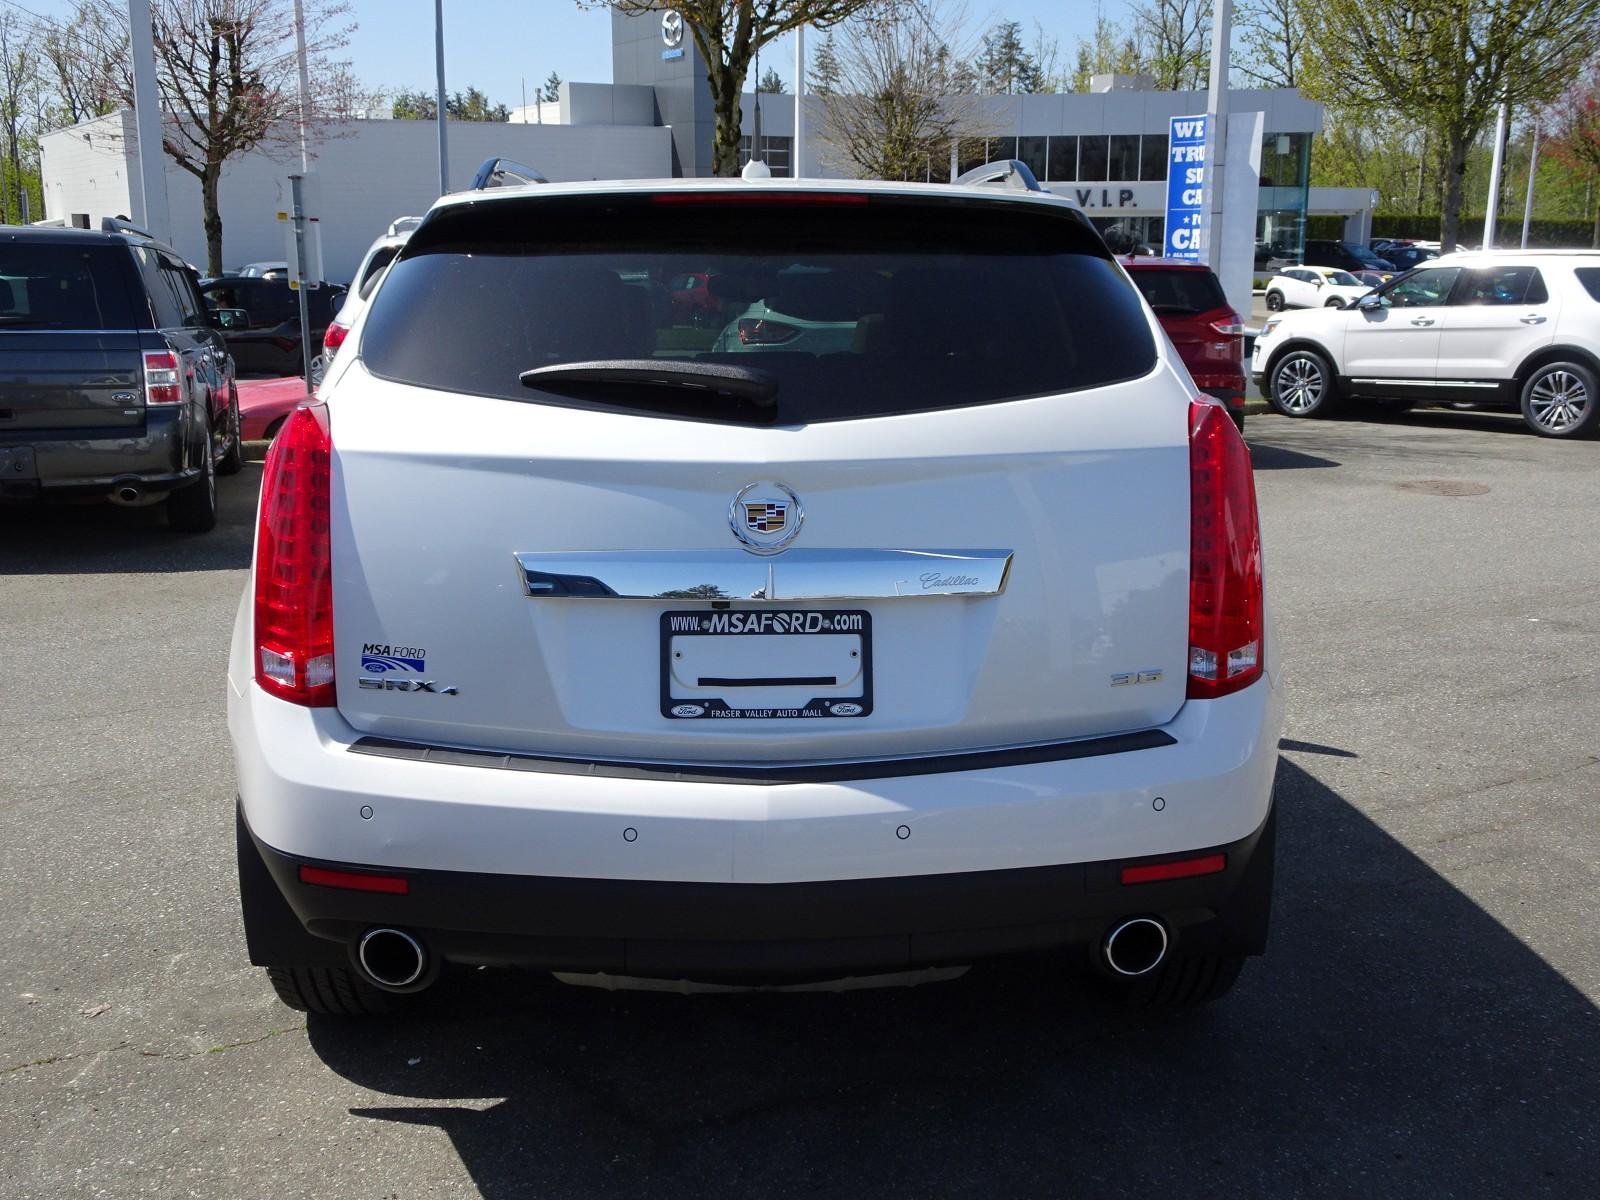 Used 2012 Cadillac SRX in Abbotsford,BC